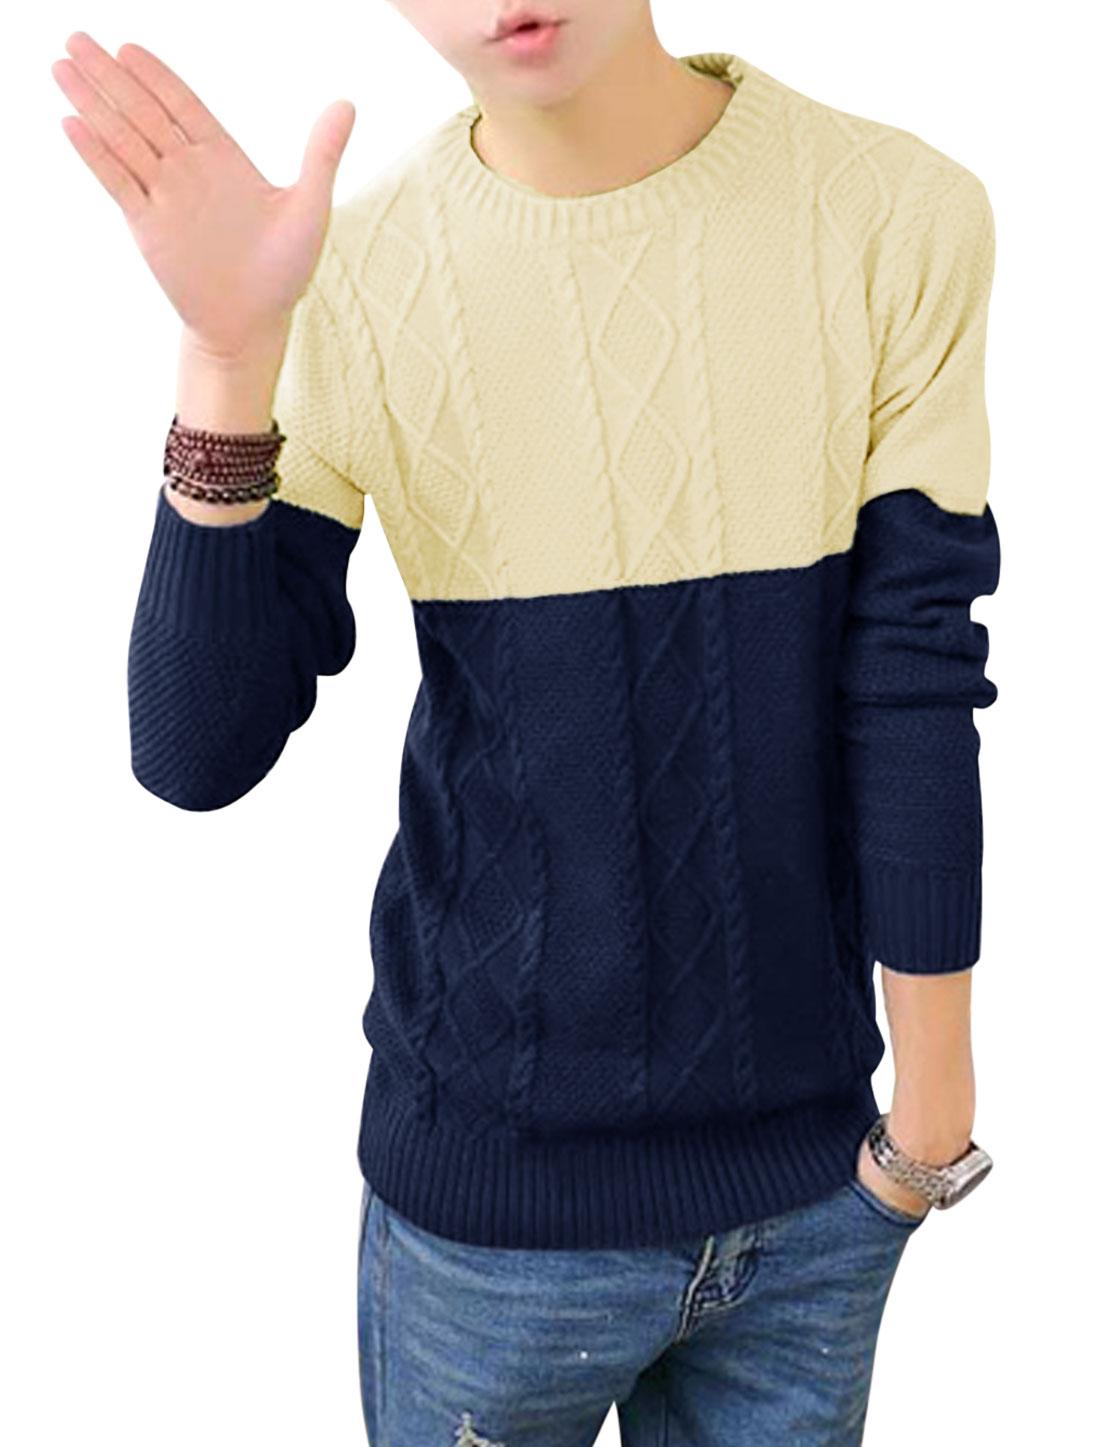 Men Argyle Design Cable Rib Knit Design Two Tone Sweater Beige Navy Blue S